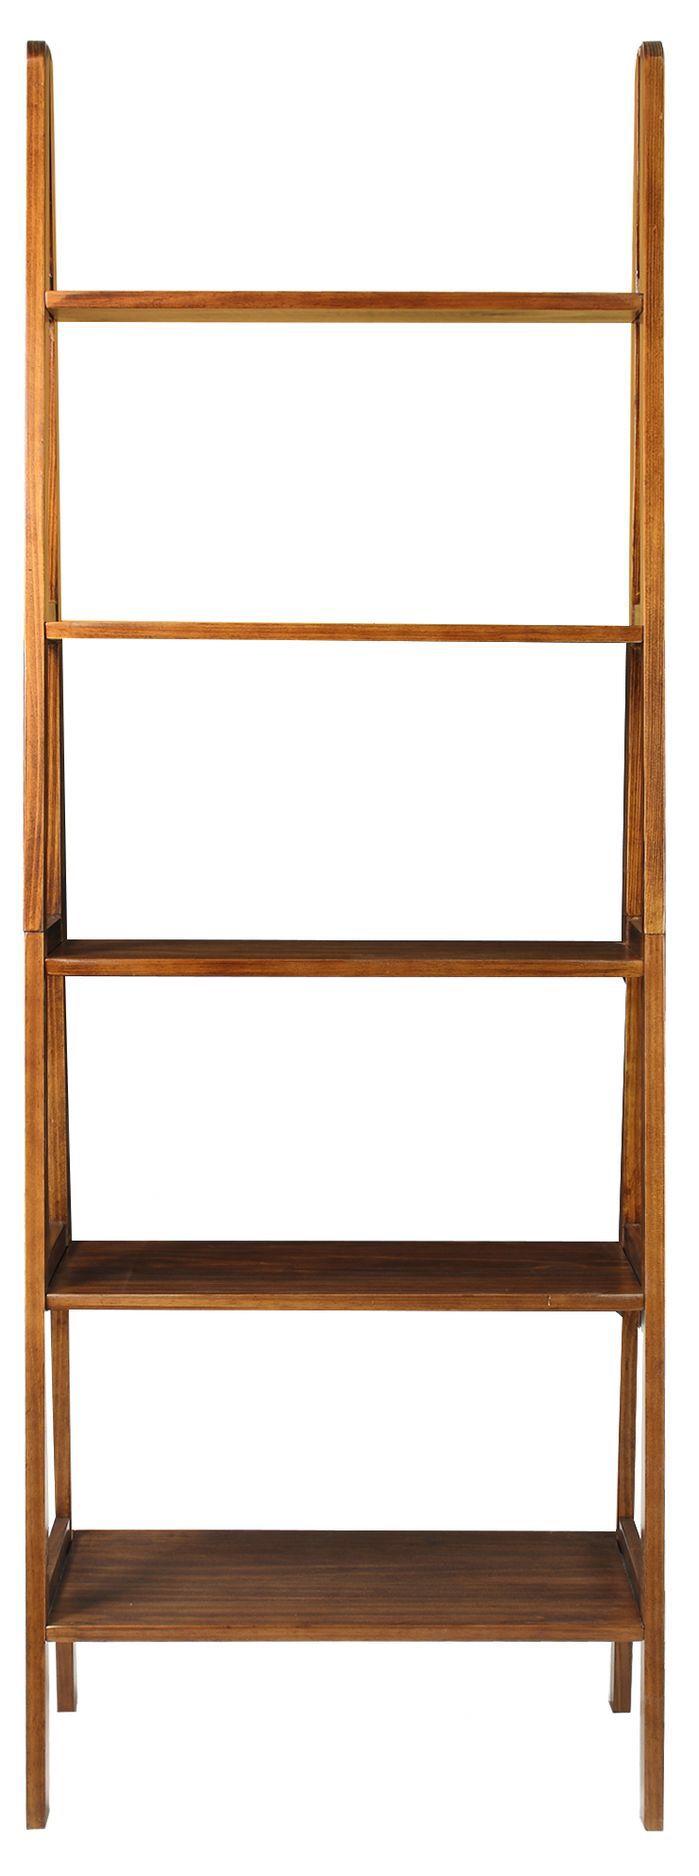 5 Shelf 72